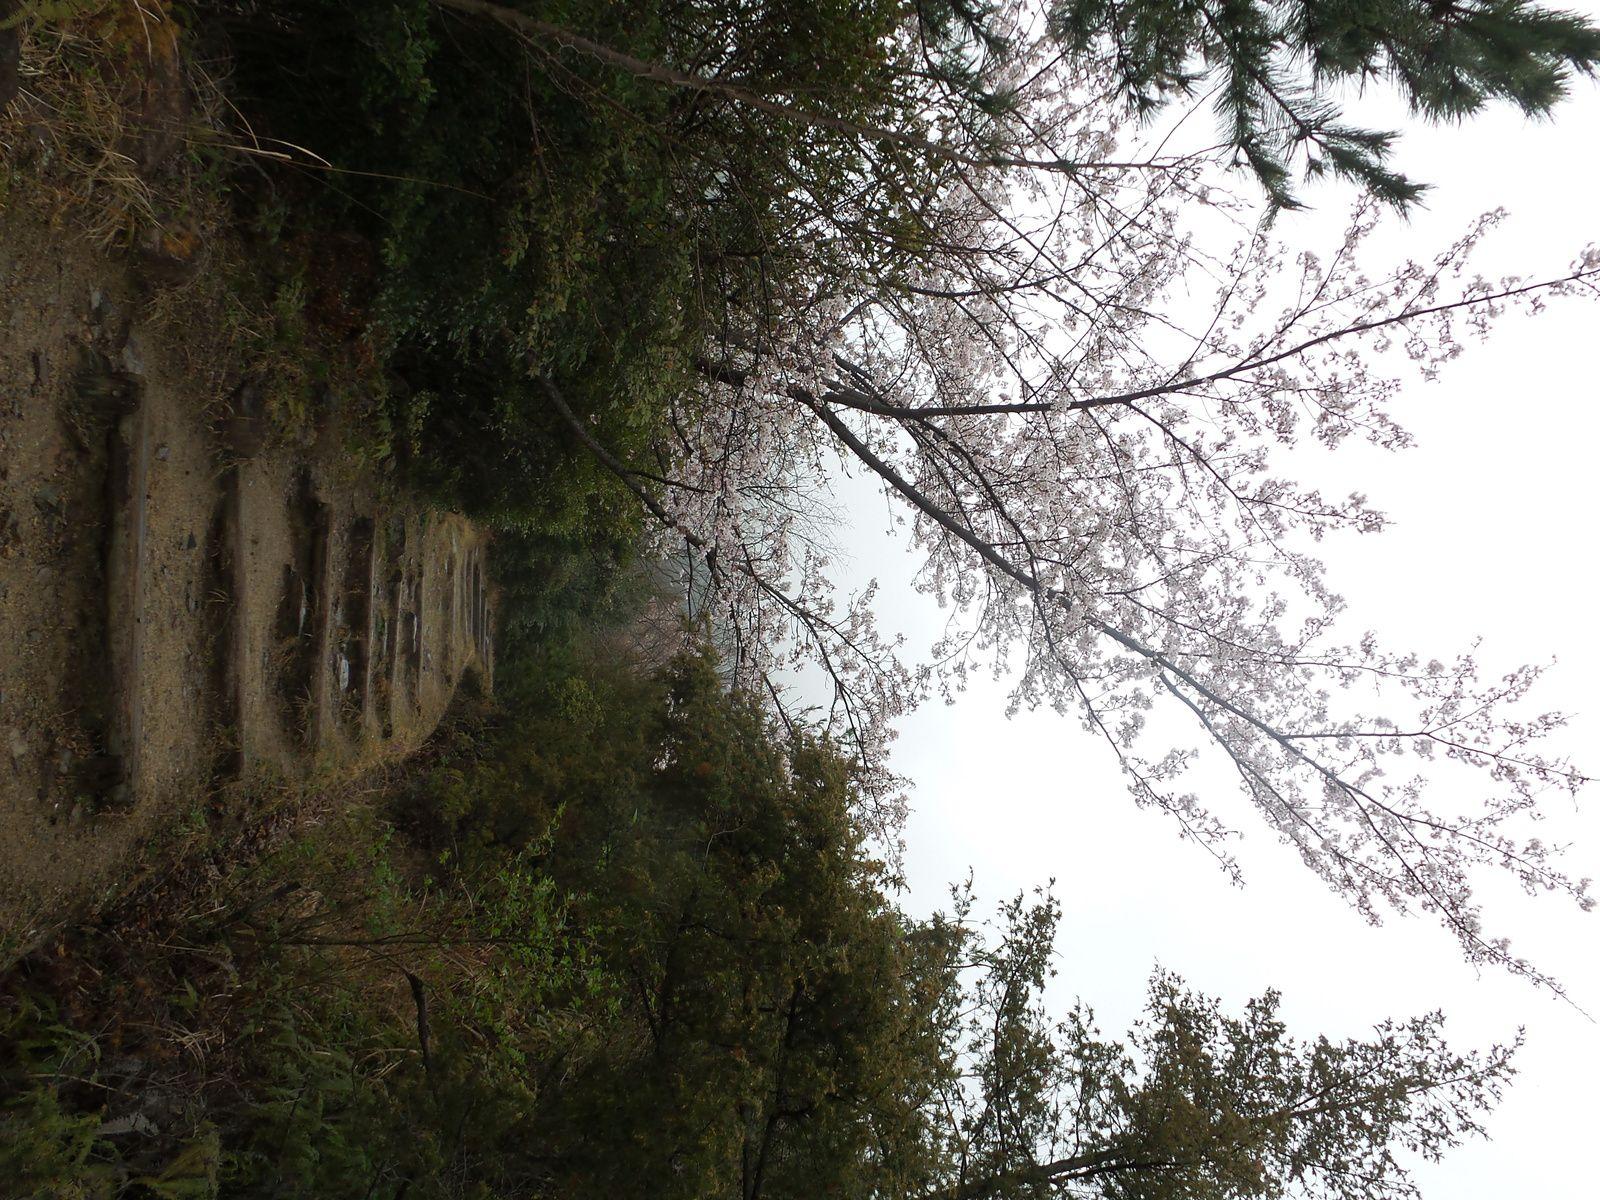 Avec Shoji Oikada, temple 81 et marche dans le brouillard